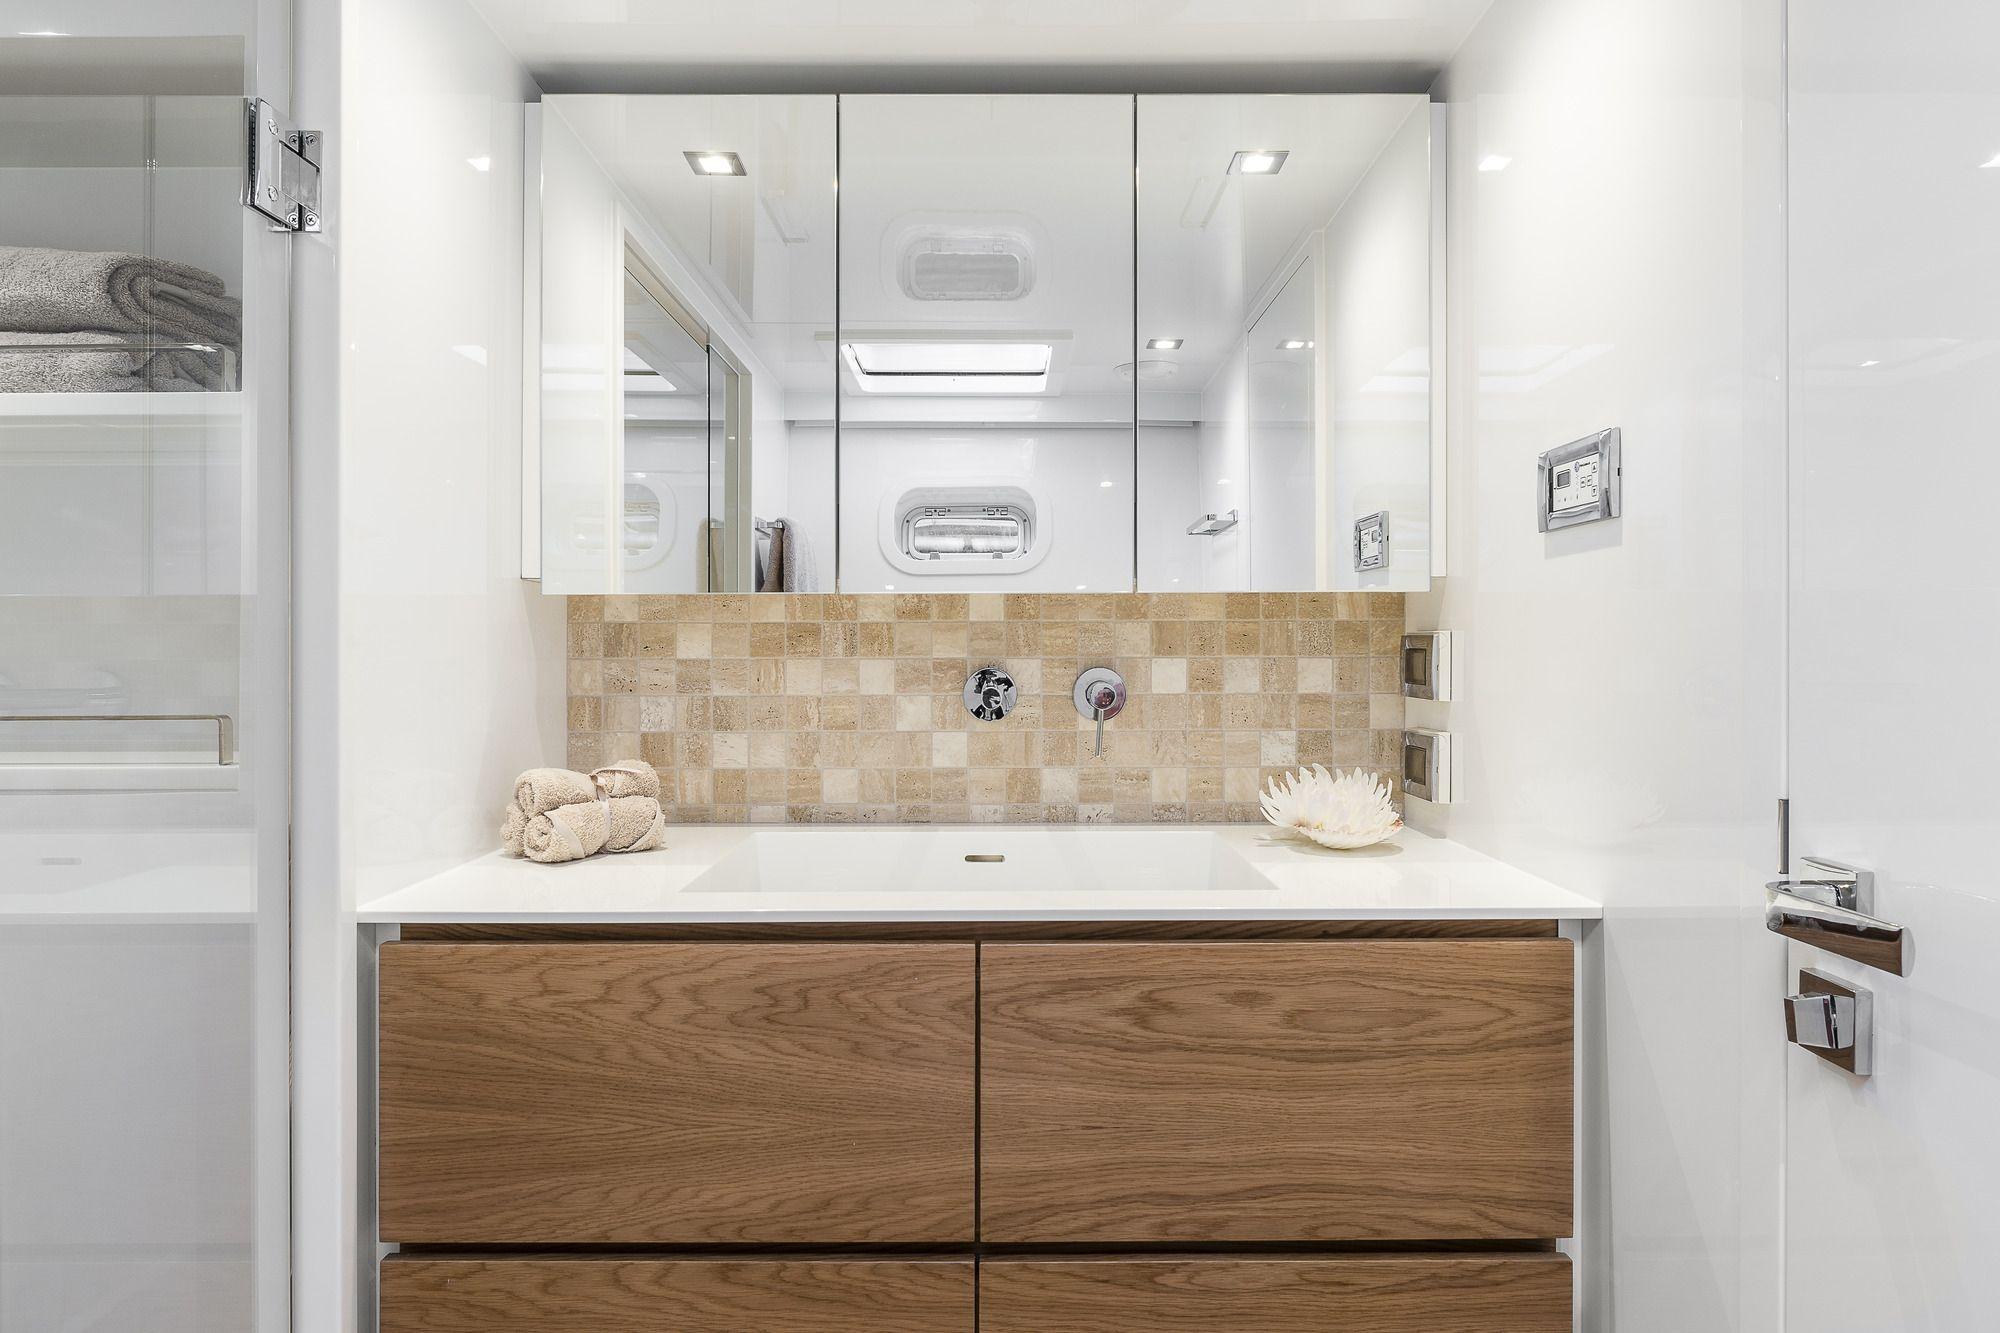 ADEA Sunreef 60 Luxury Catamaran  Contemporary Bathroom